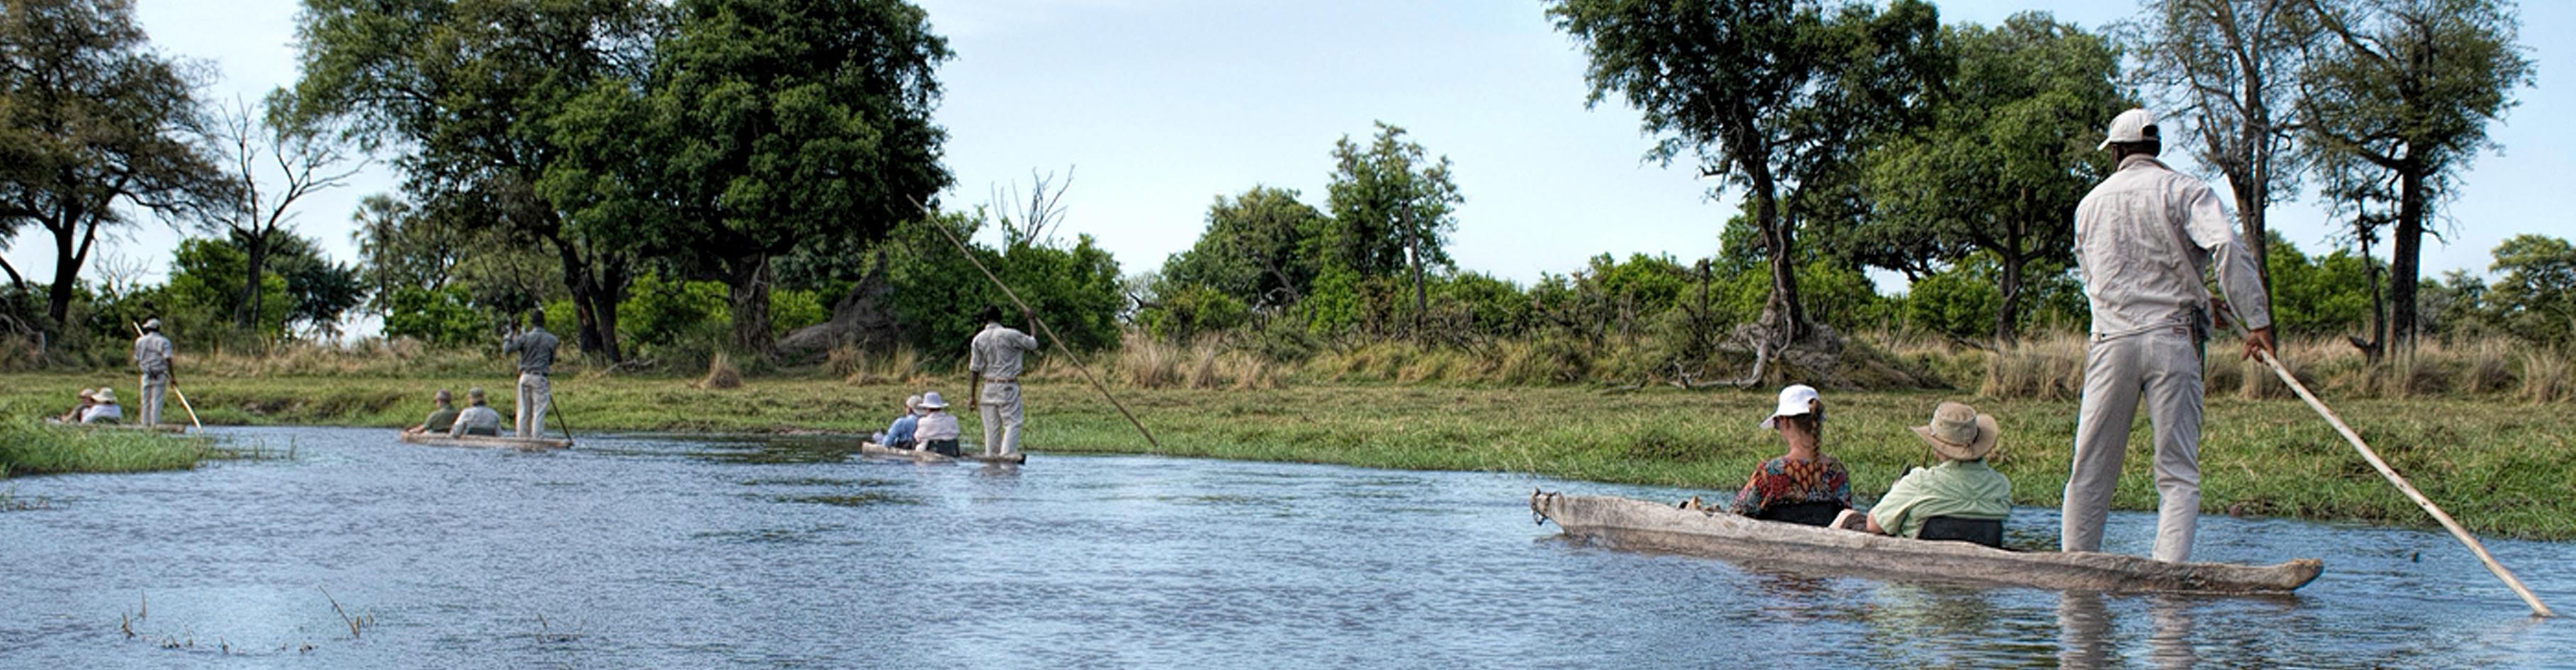 mokoros, Chief's Island, Okavango Delta, Botswana